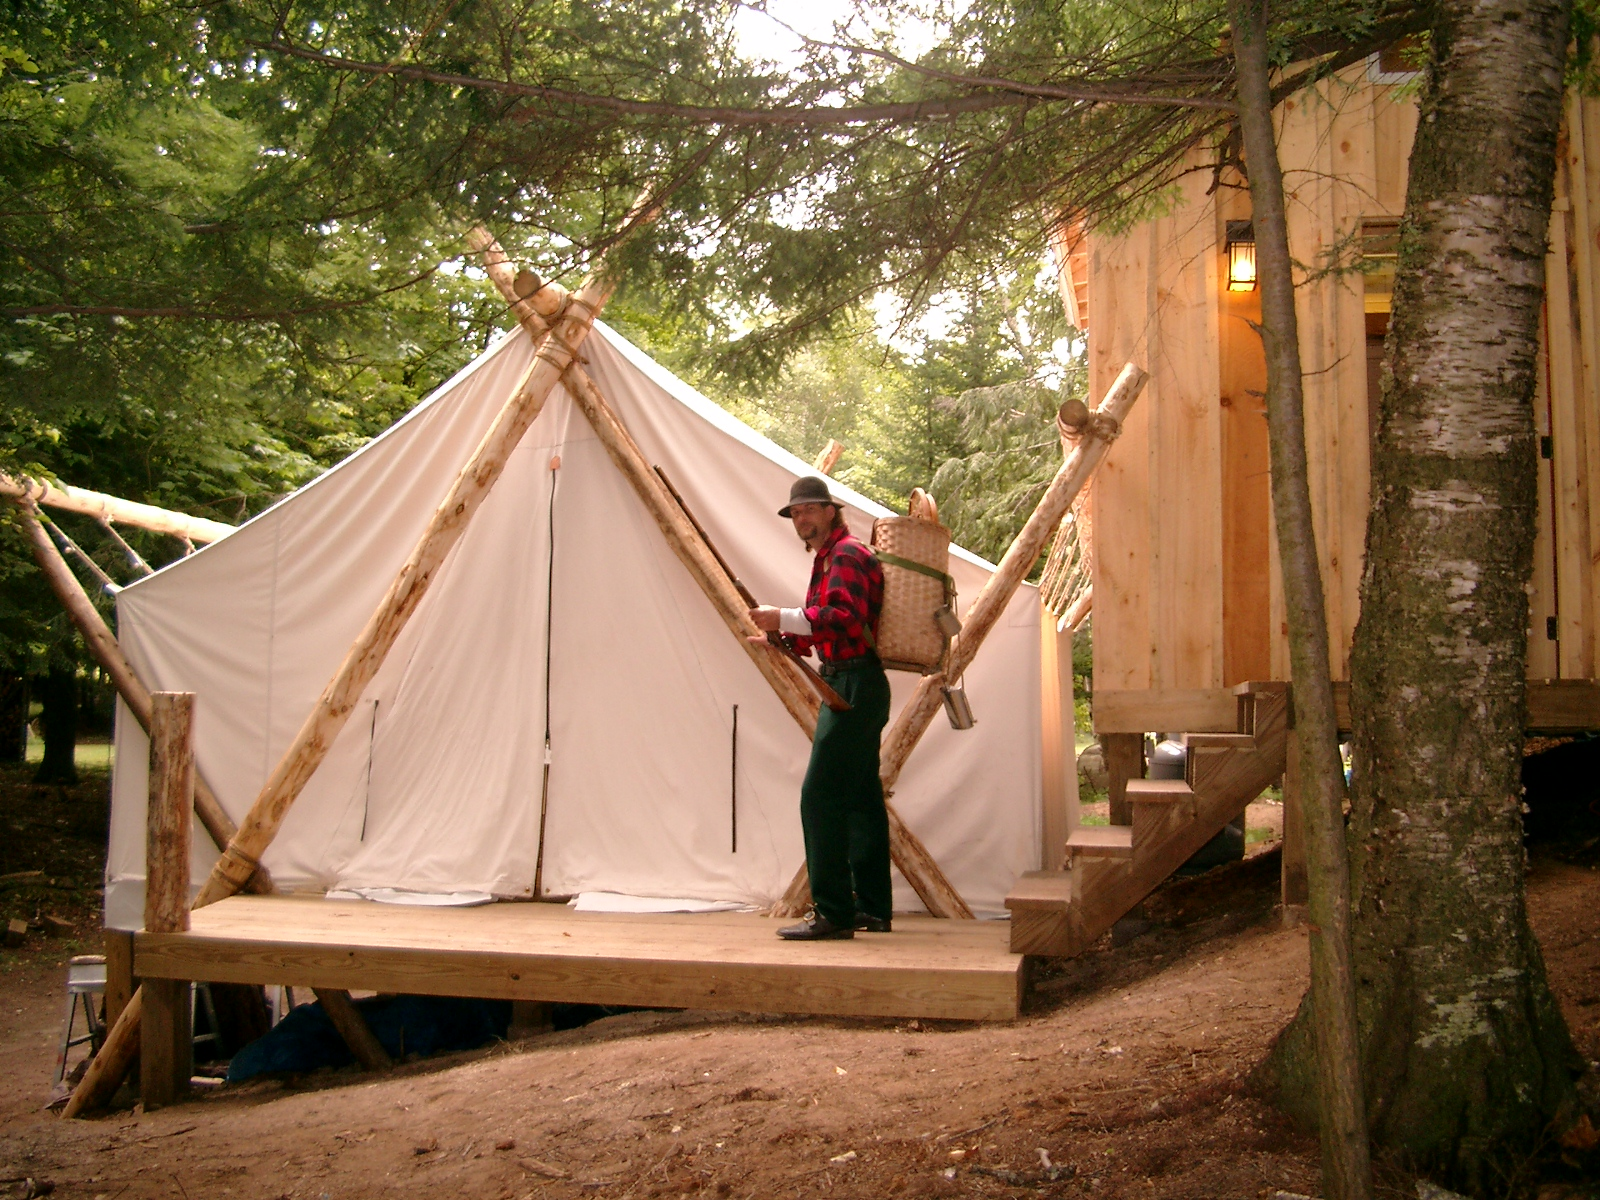 & Guide Tent #400 Lakeside $165 | The Woods Inn